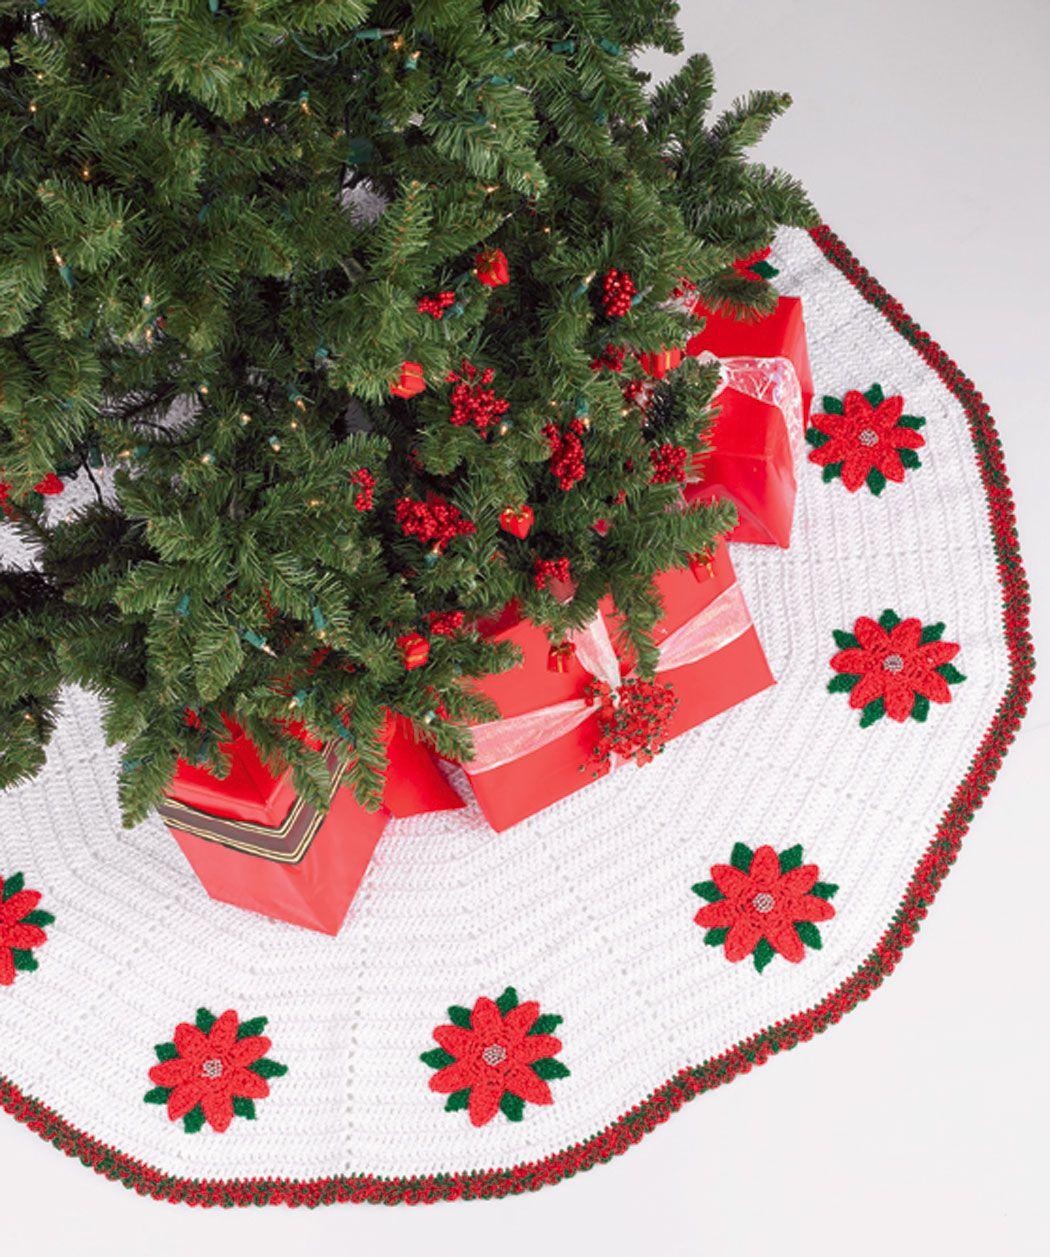 Red Heart Tree Skirt w/Poinsettias-Free Pattern | Christmas Crochet ...